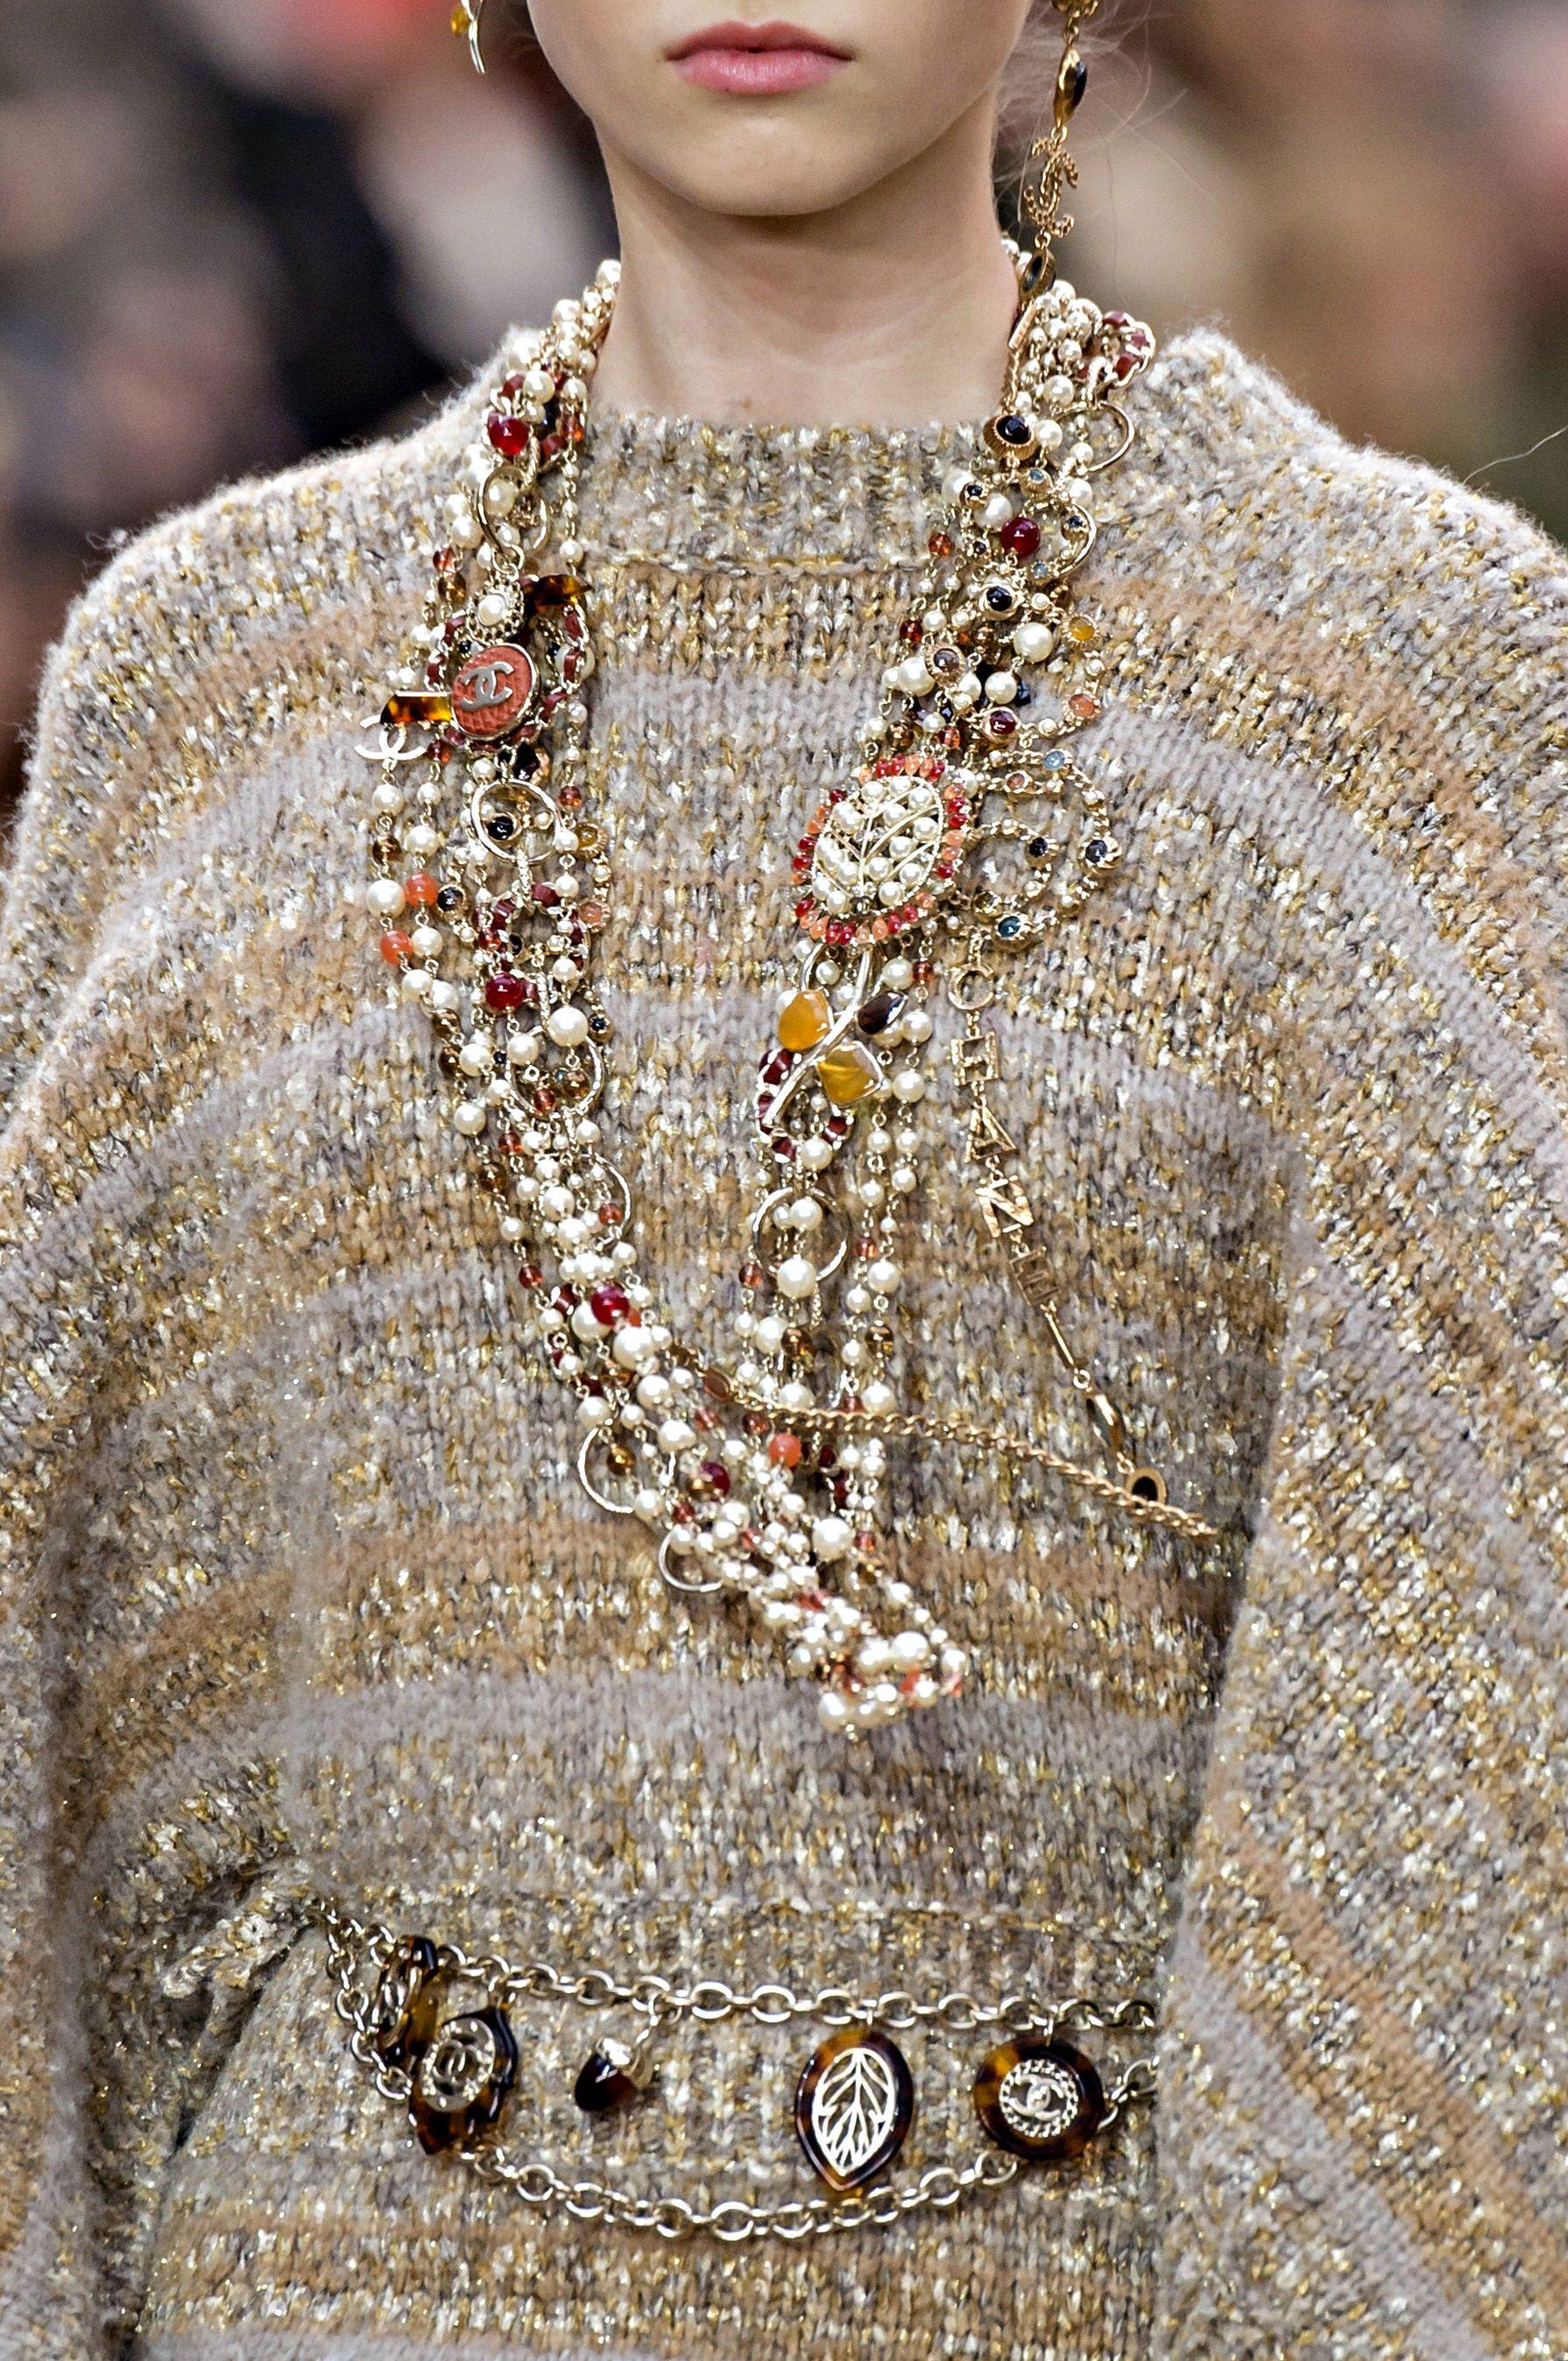 d42a2390b9b1 Chanel Fall-Winter 2018-2019 .Detail | CHANNEL ~ 3 | Fashion, Chanel ...